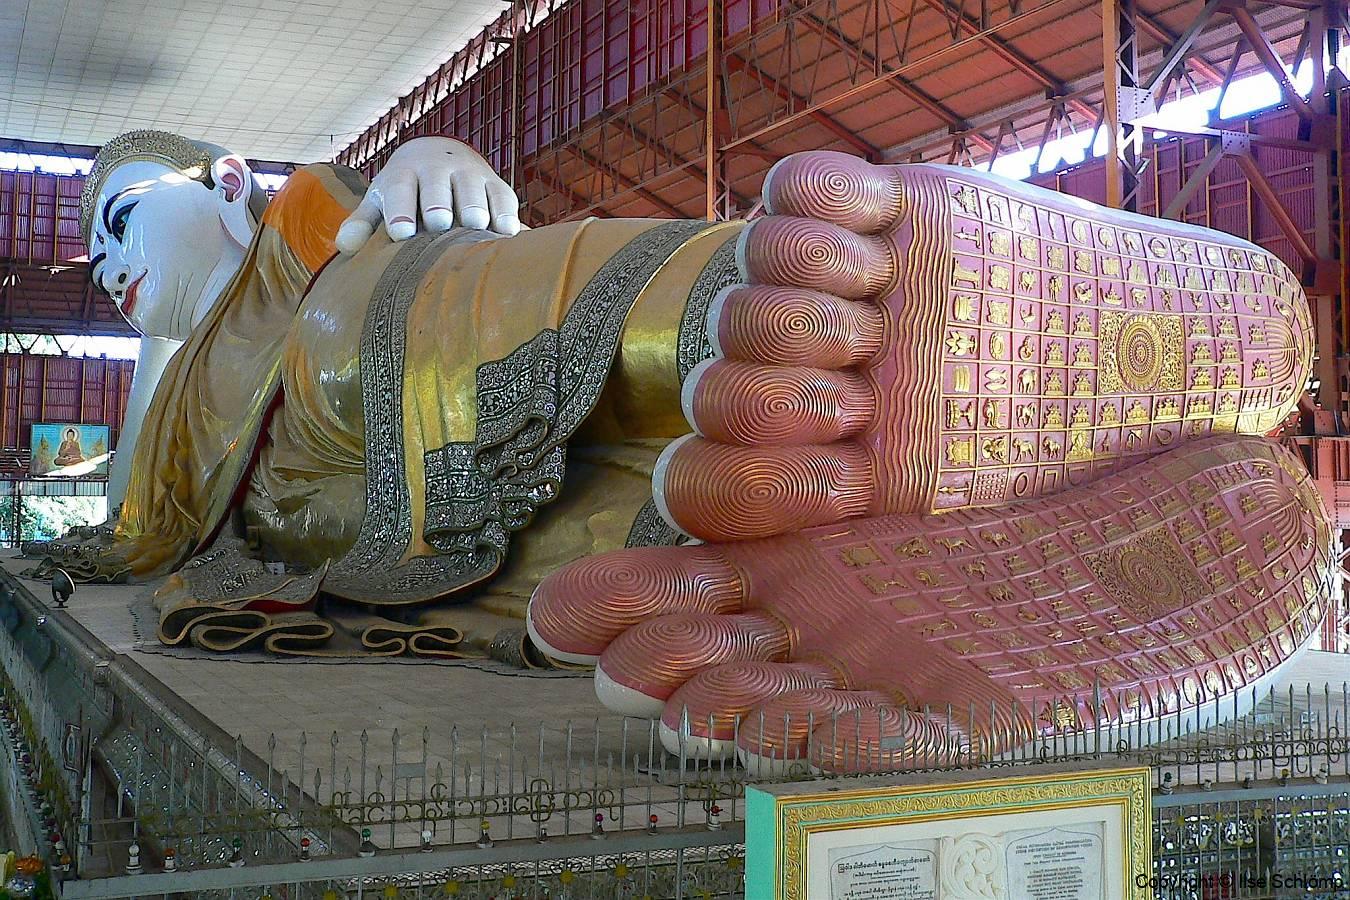 Myanmar, Yangon, Kyaukthatgyi Pagode, 70 m langer Liegender Buddha